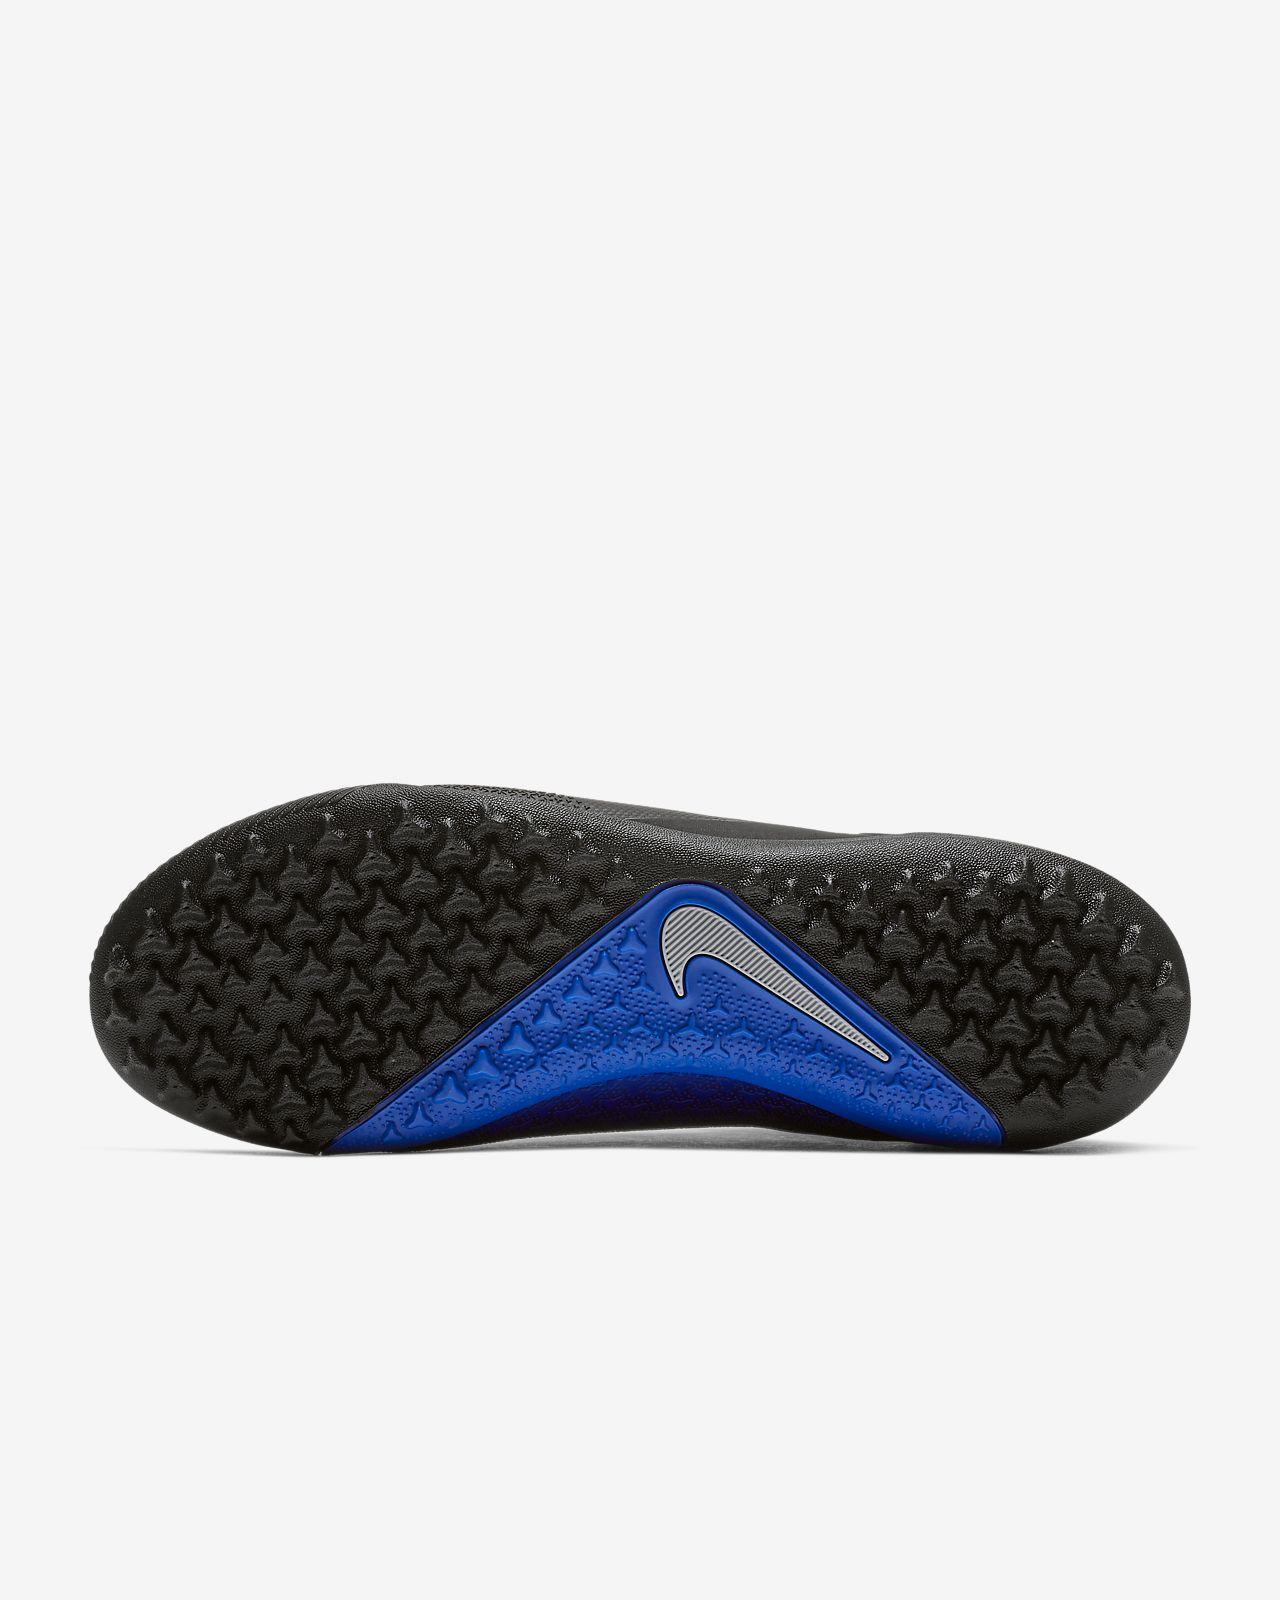 Nike Shoes Nike Magista Onda Ii Fg Mens Size 8 Soccer